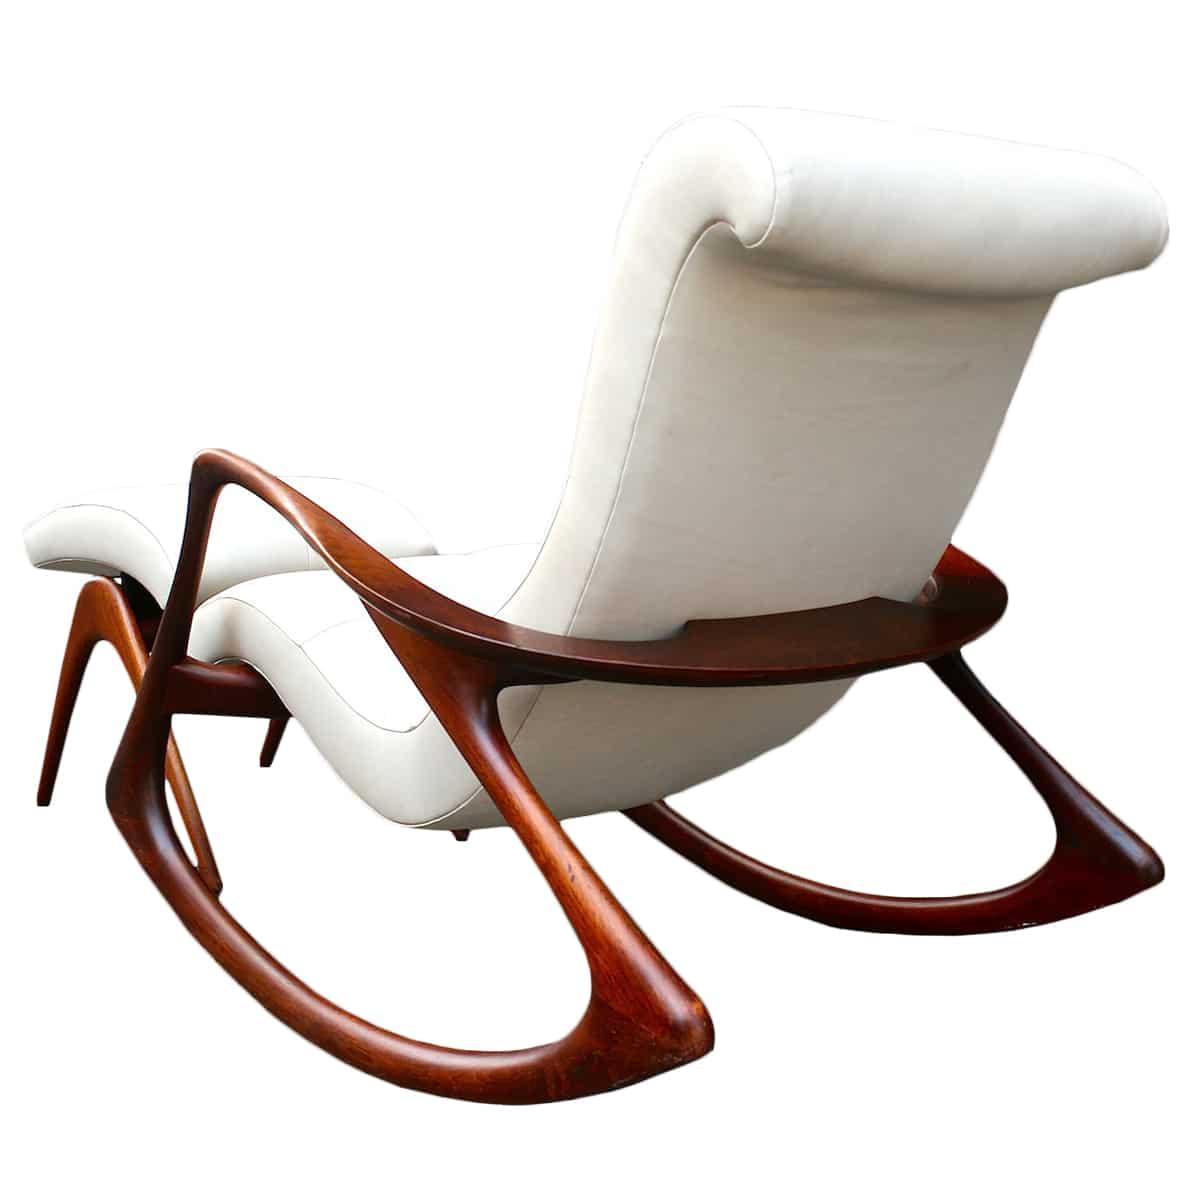 Vladimir Kagan Rocking Chair ...  sc 1 st  Todd Merrill Studio & Vladimir Kagan Rocking Chair and Ottoman Circa 1950s - Todd Merrill